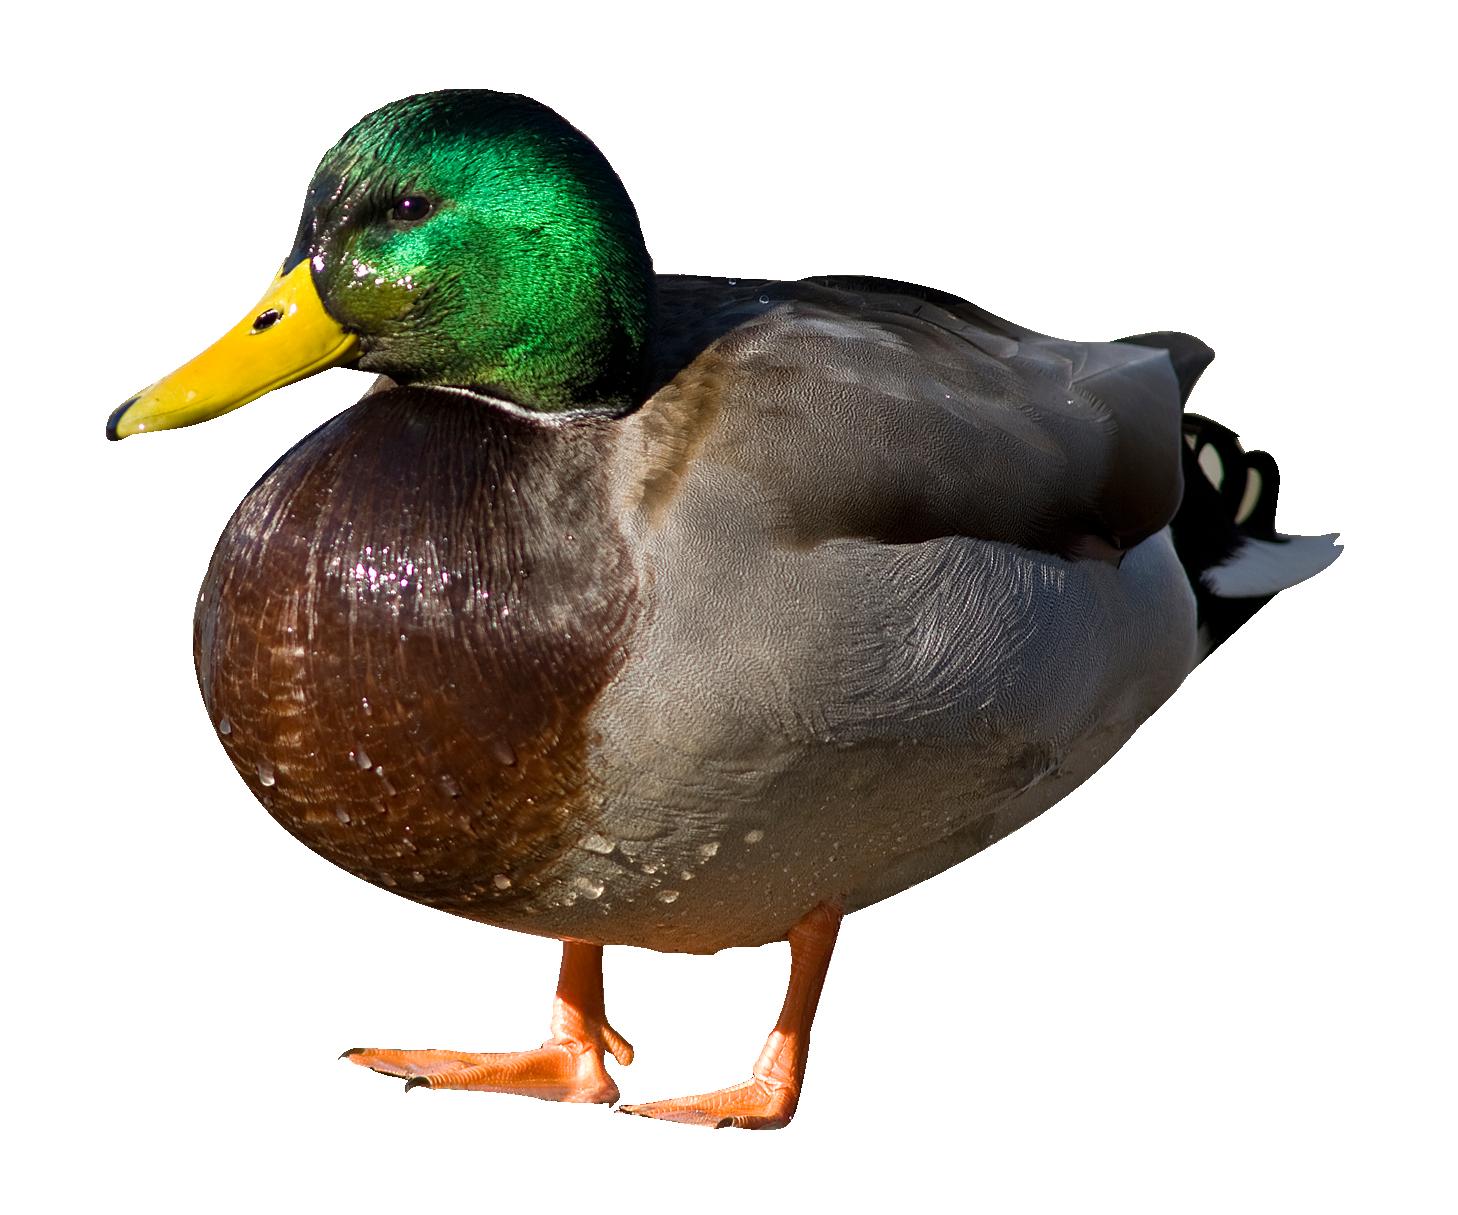 Water clipart mallard duck. Png image purepng free